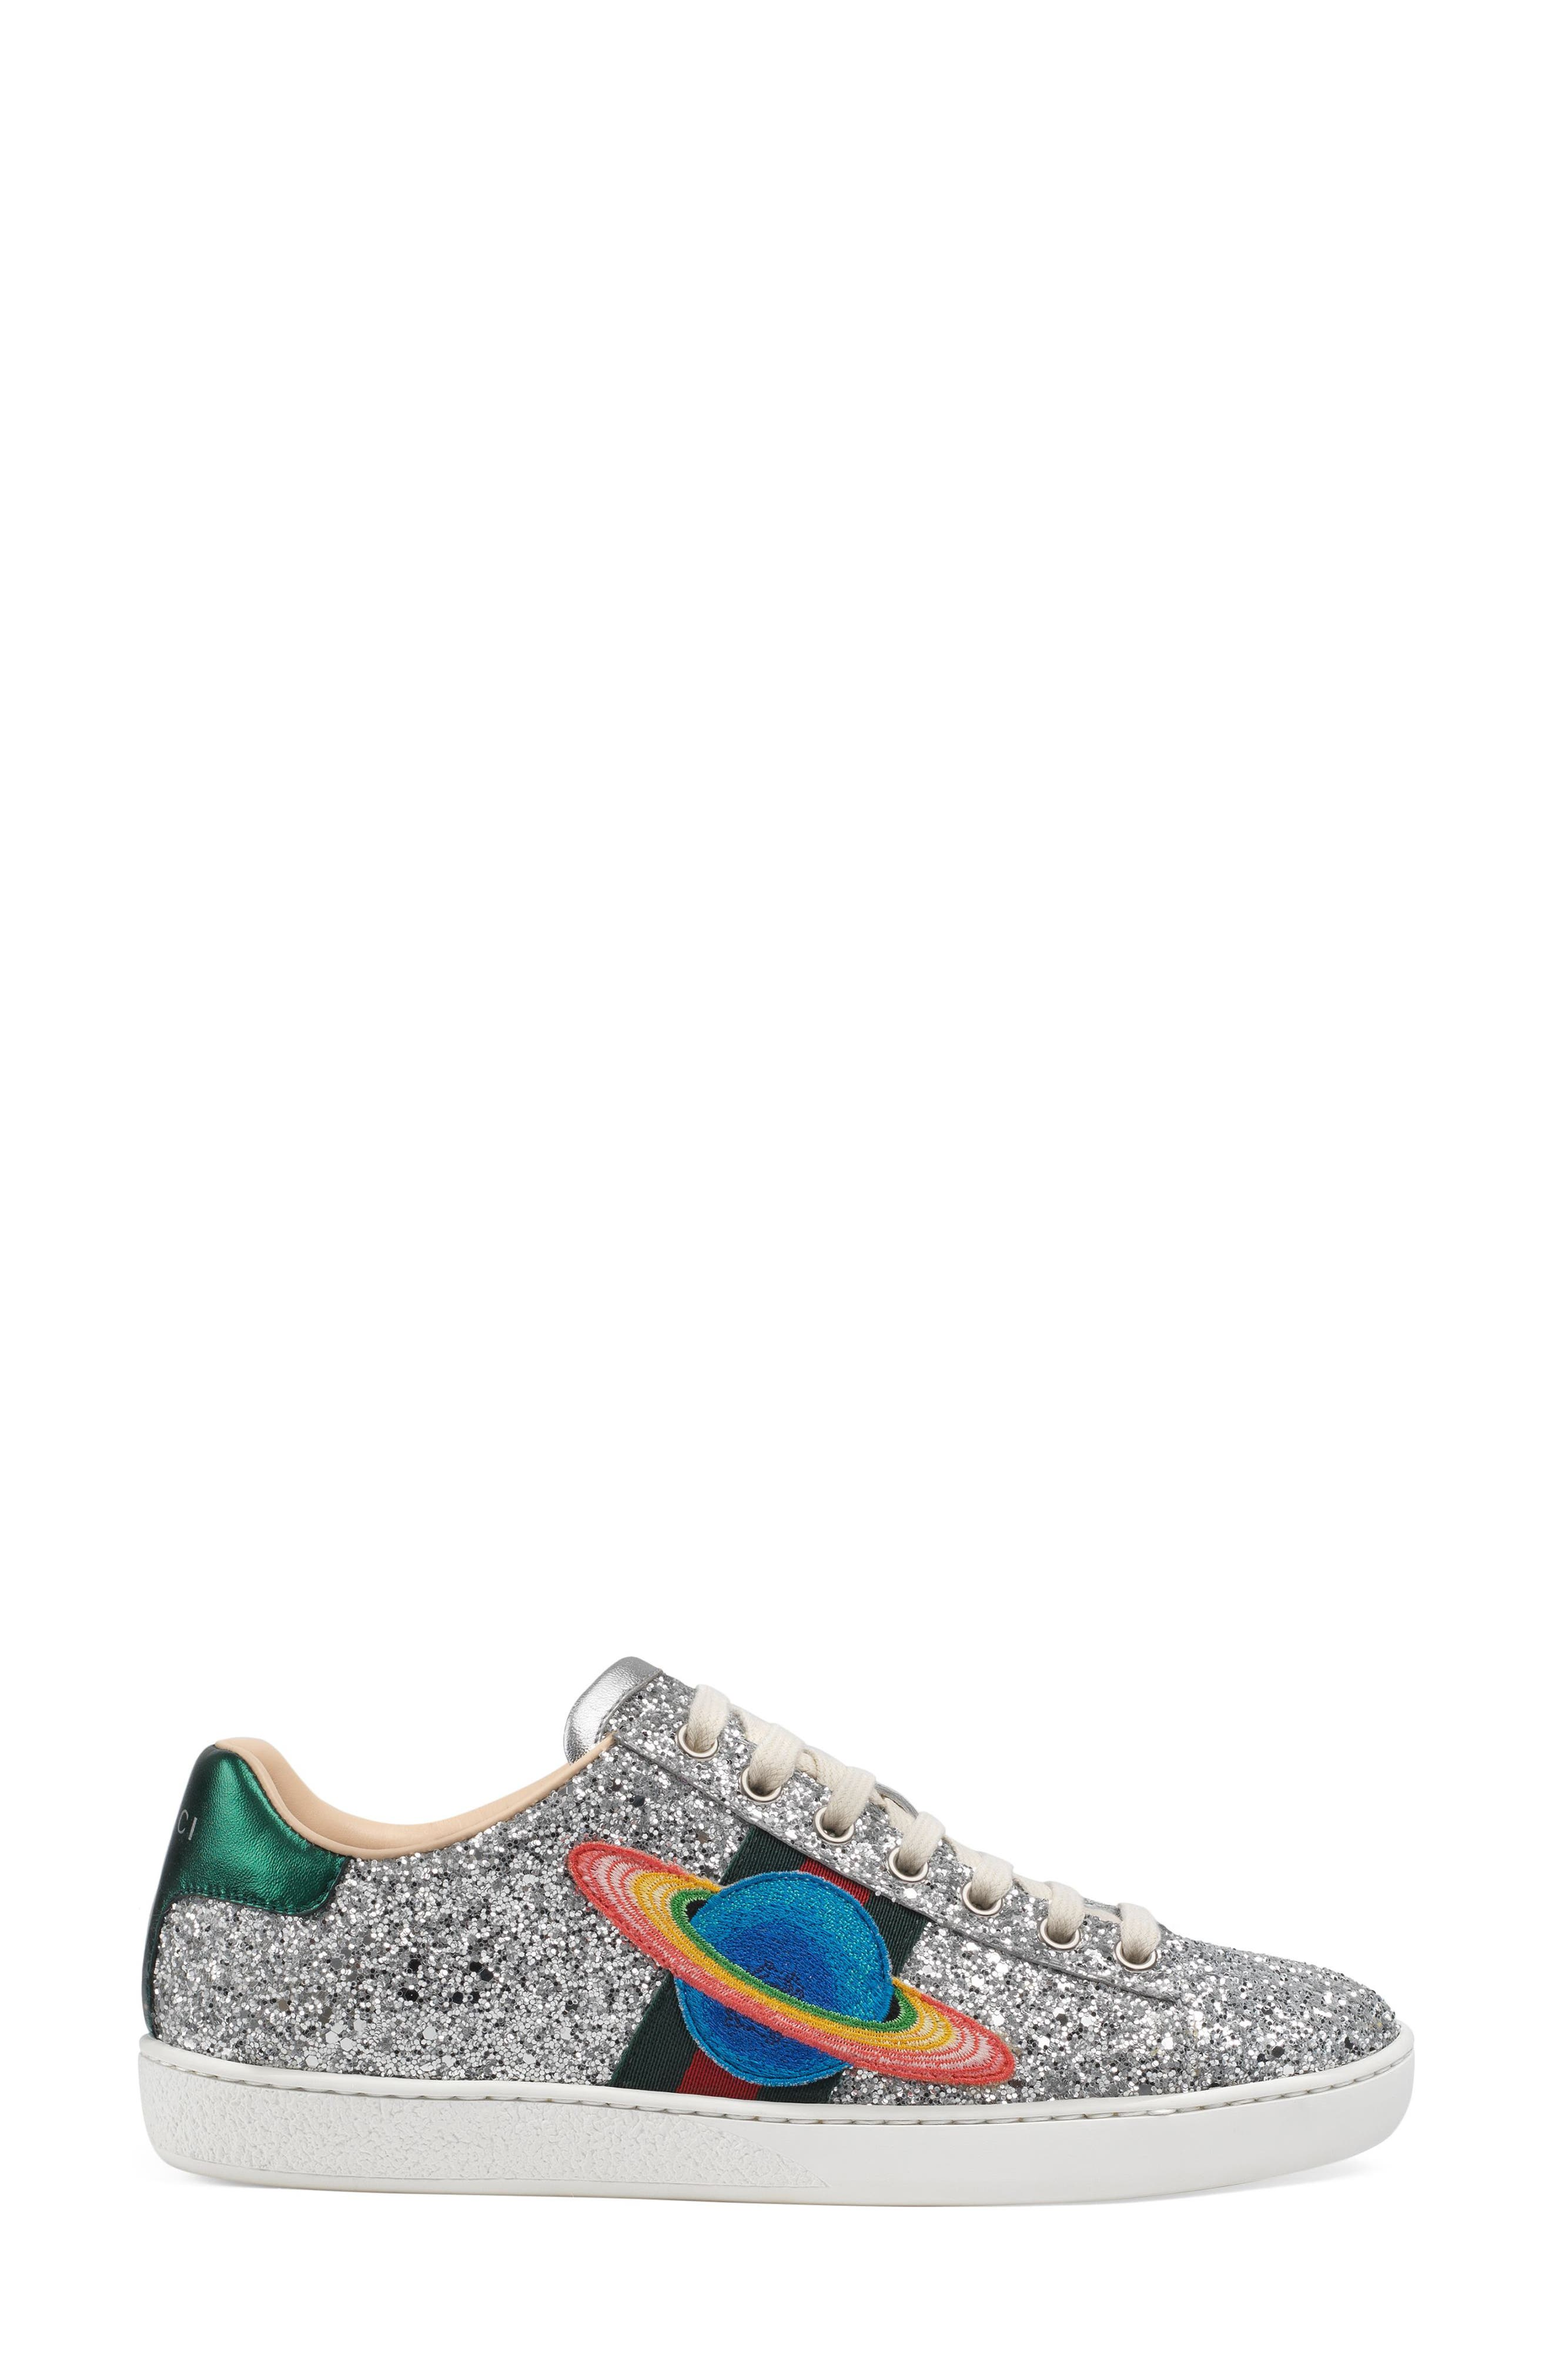 Alternate Image 2  - Gucci 'New Ace' Low Top Sneaker (Women)